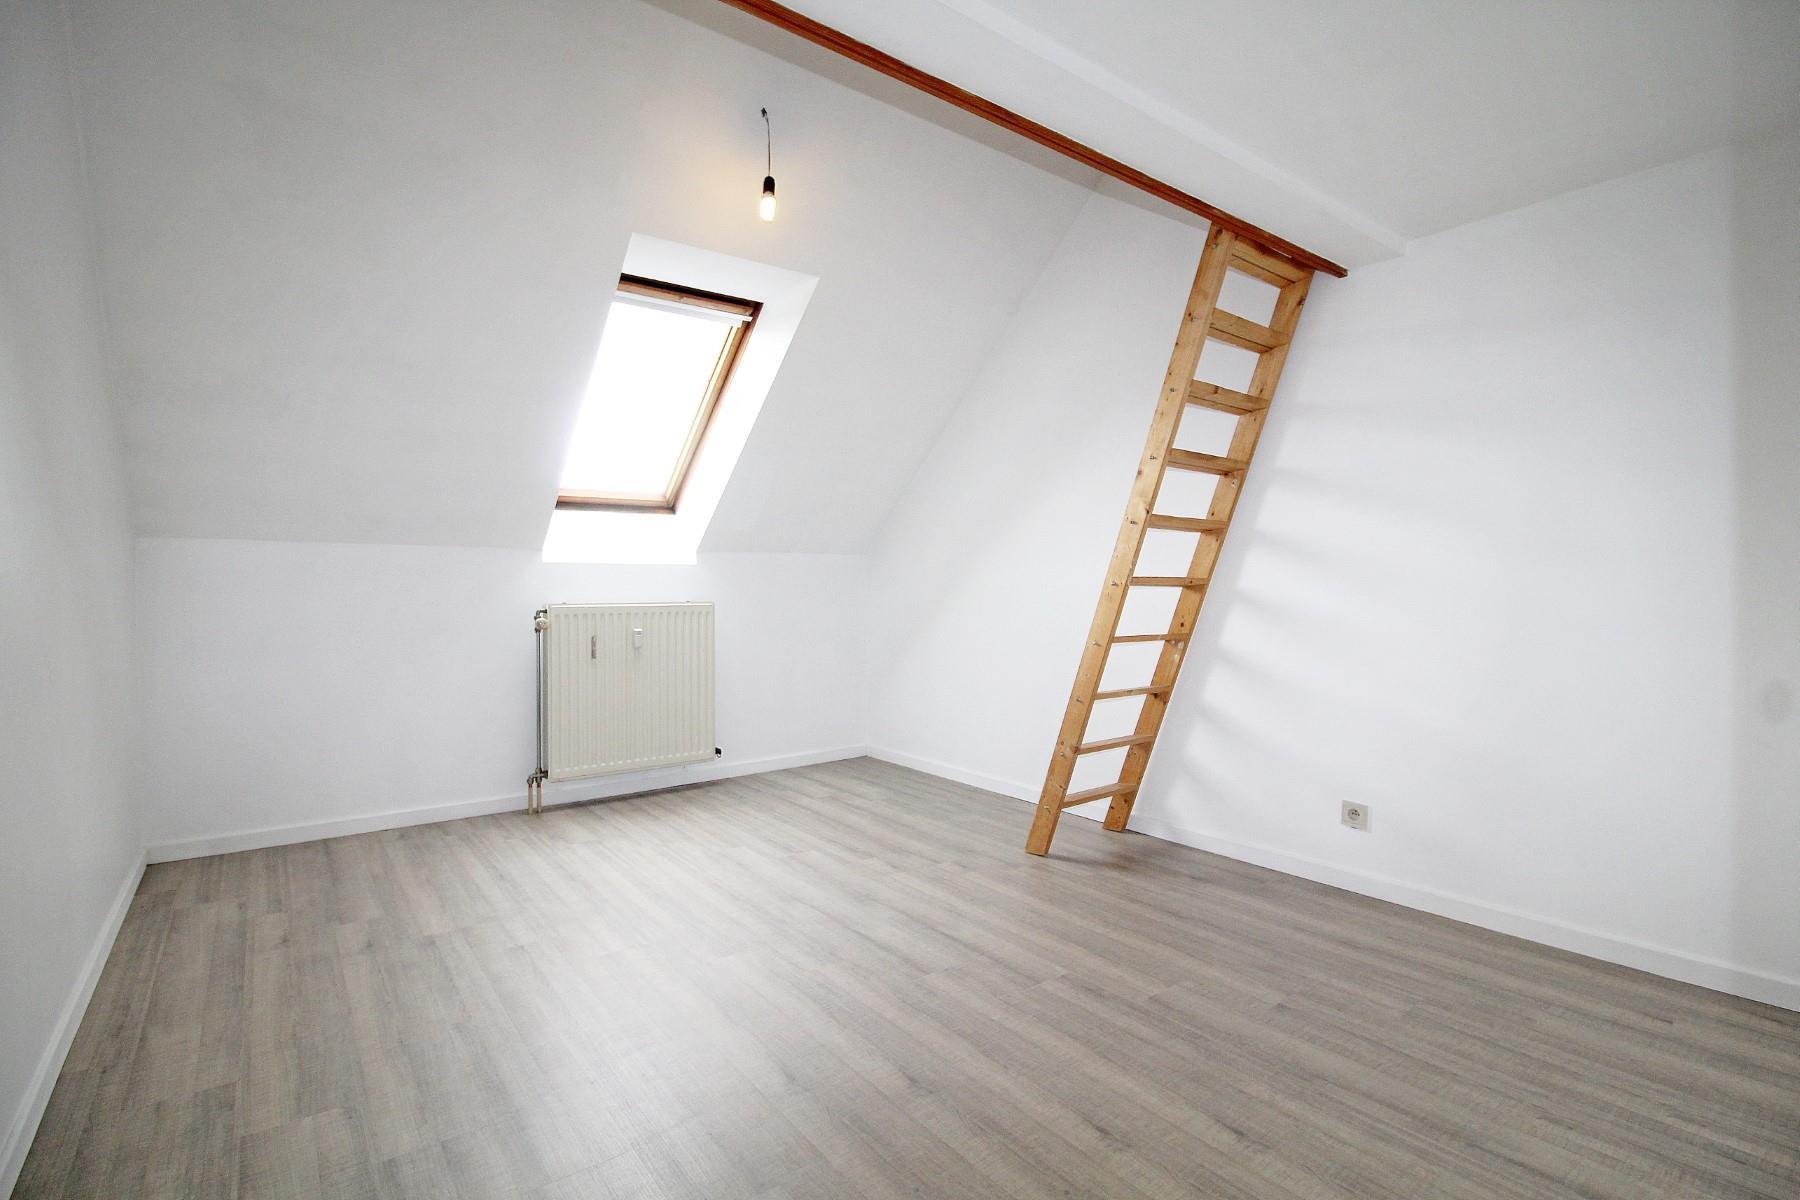 Appartement - Eghezée - #4140908-5